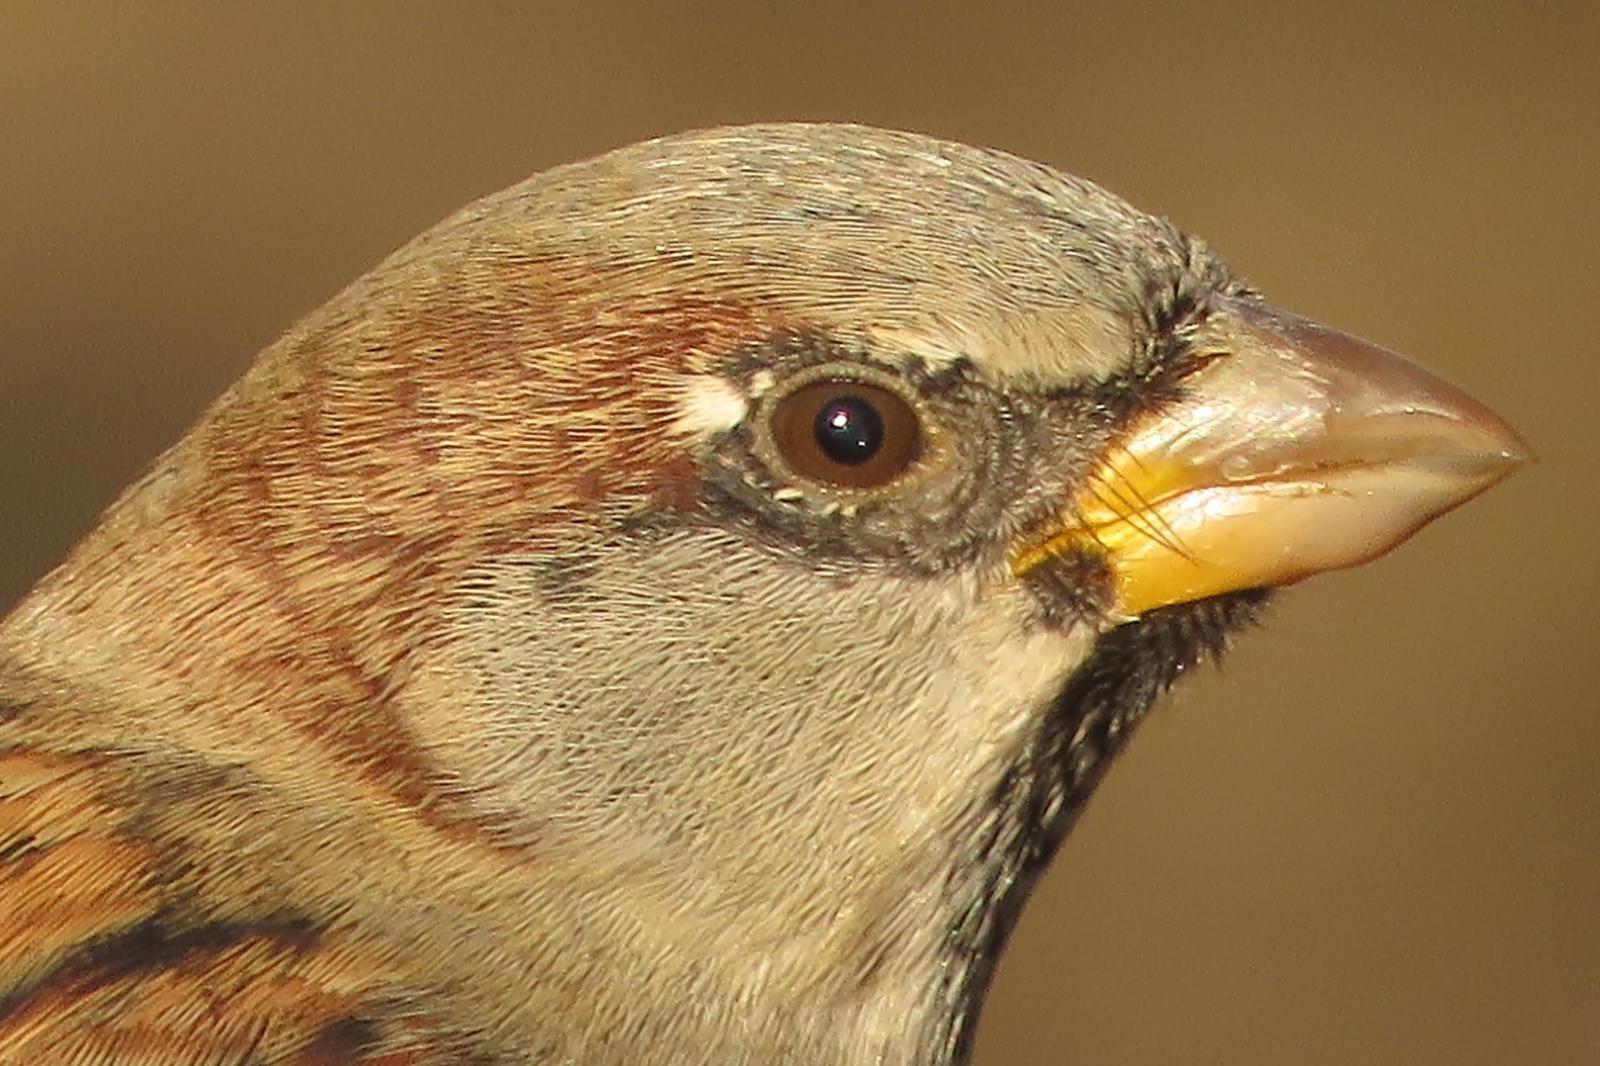 House Sparrow Photo by Bob Neugebauer